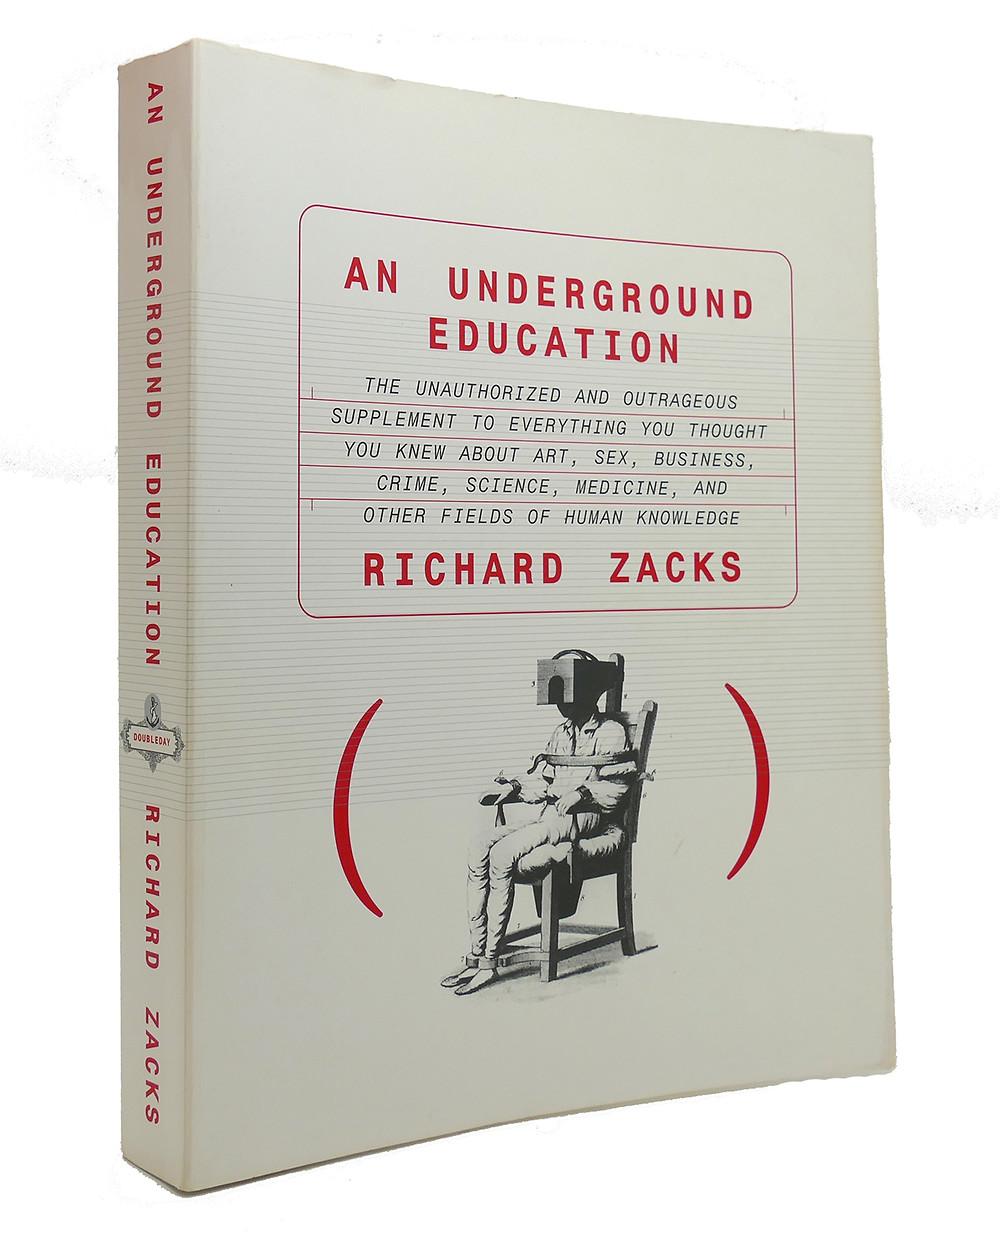 An Underground Education (1997) by Richard Zacks